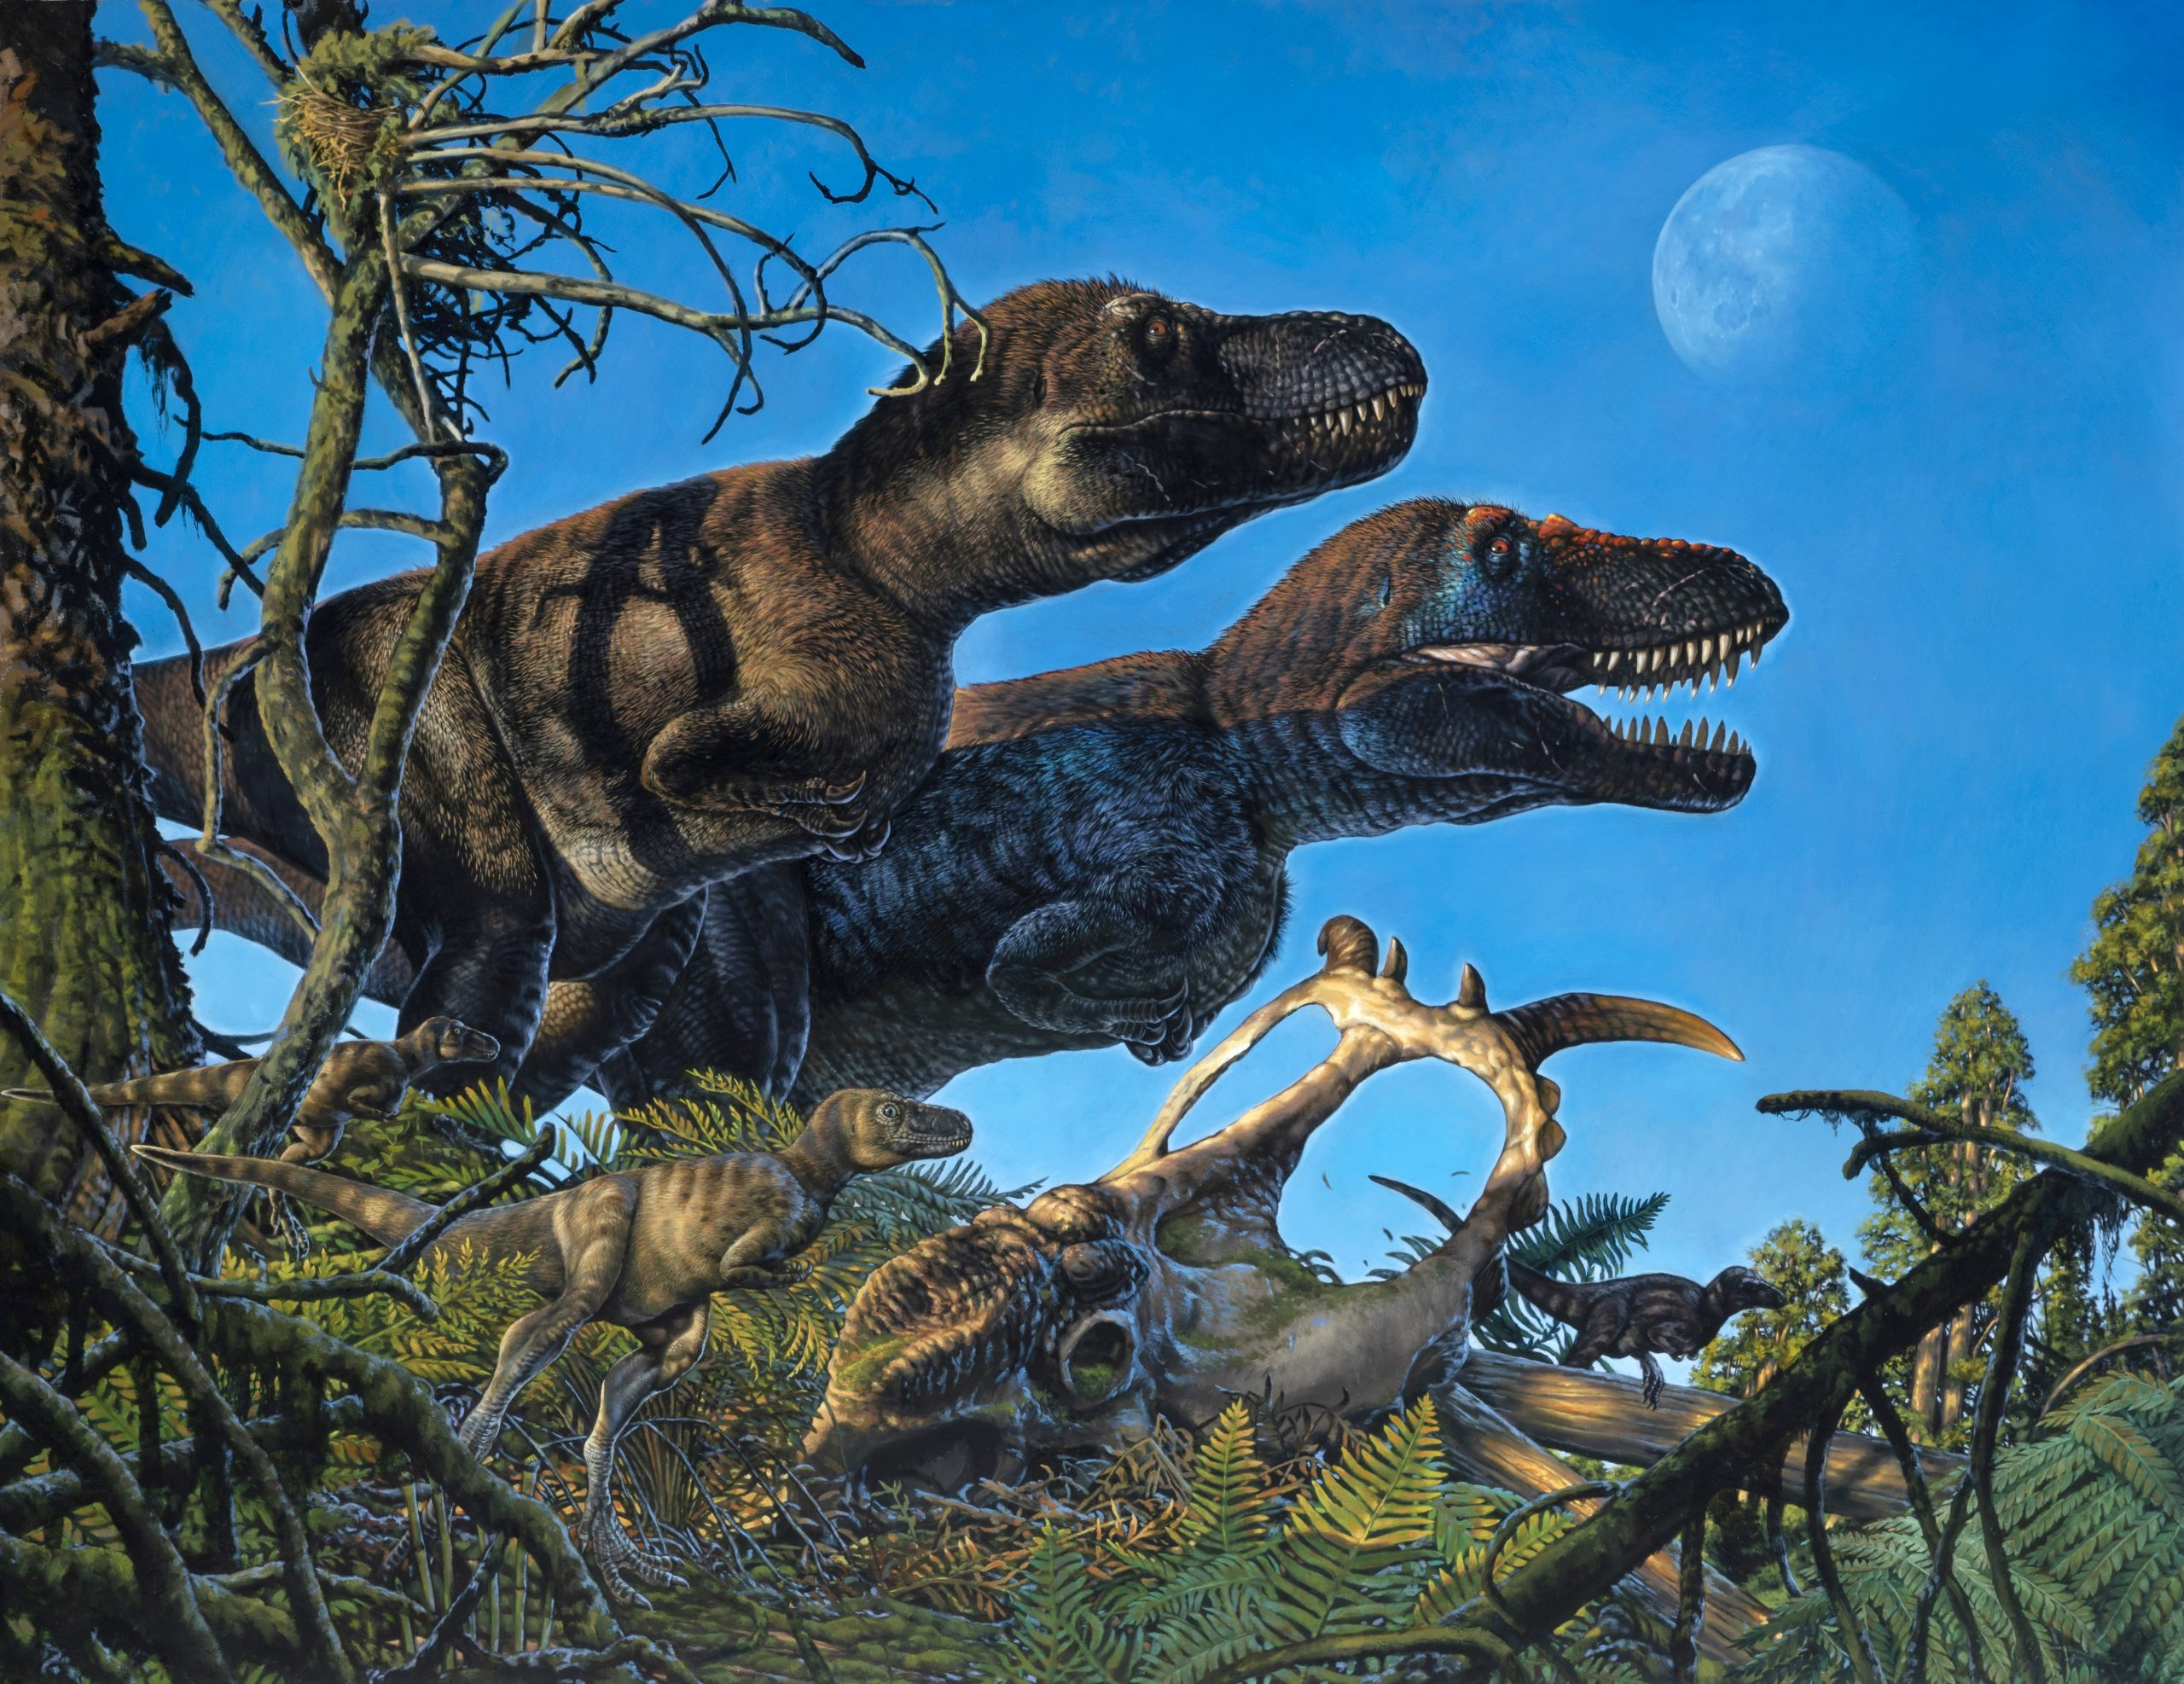 Dinosaures vivint a l'Àrtic | James Havens / University of Alaska Fairbanks